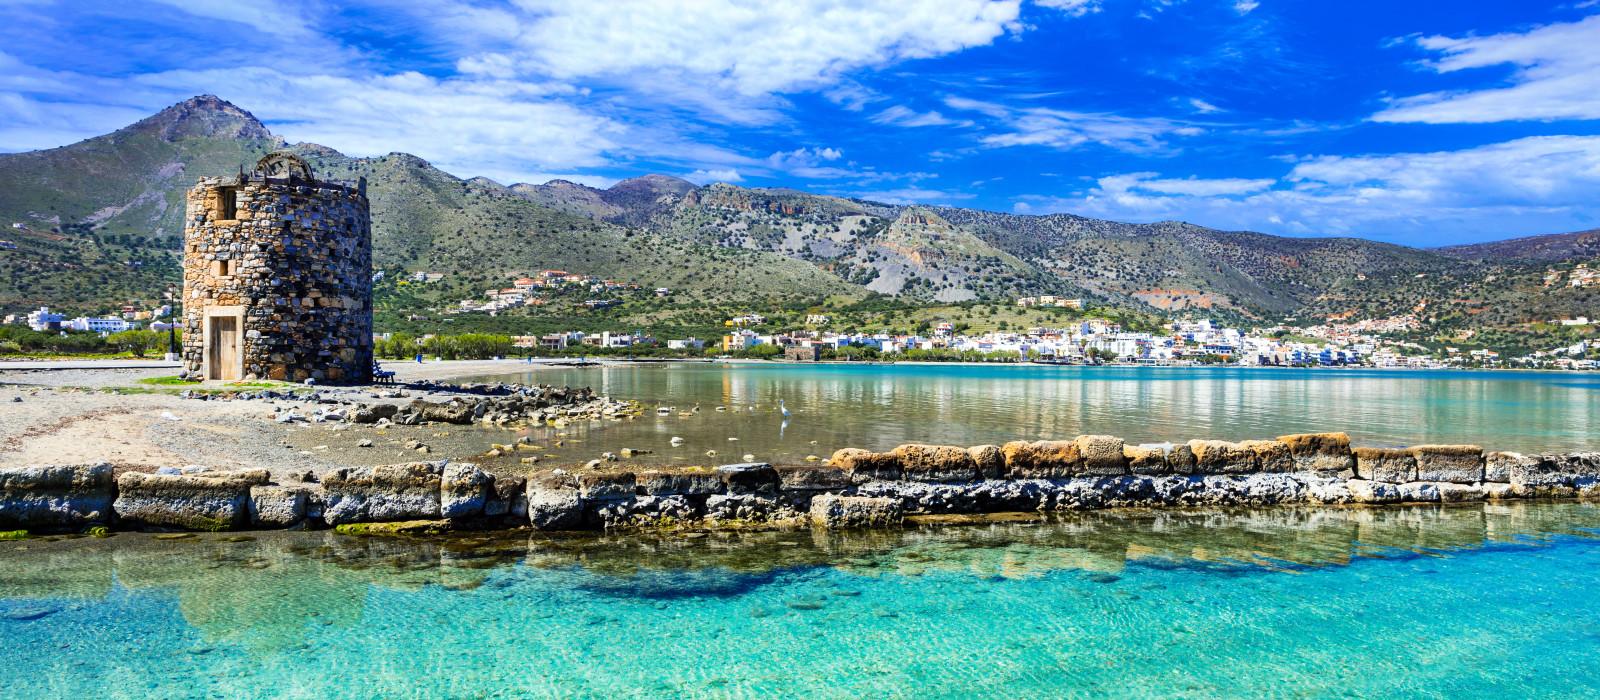 Reiseziel Elounda Griechenland